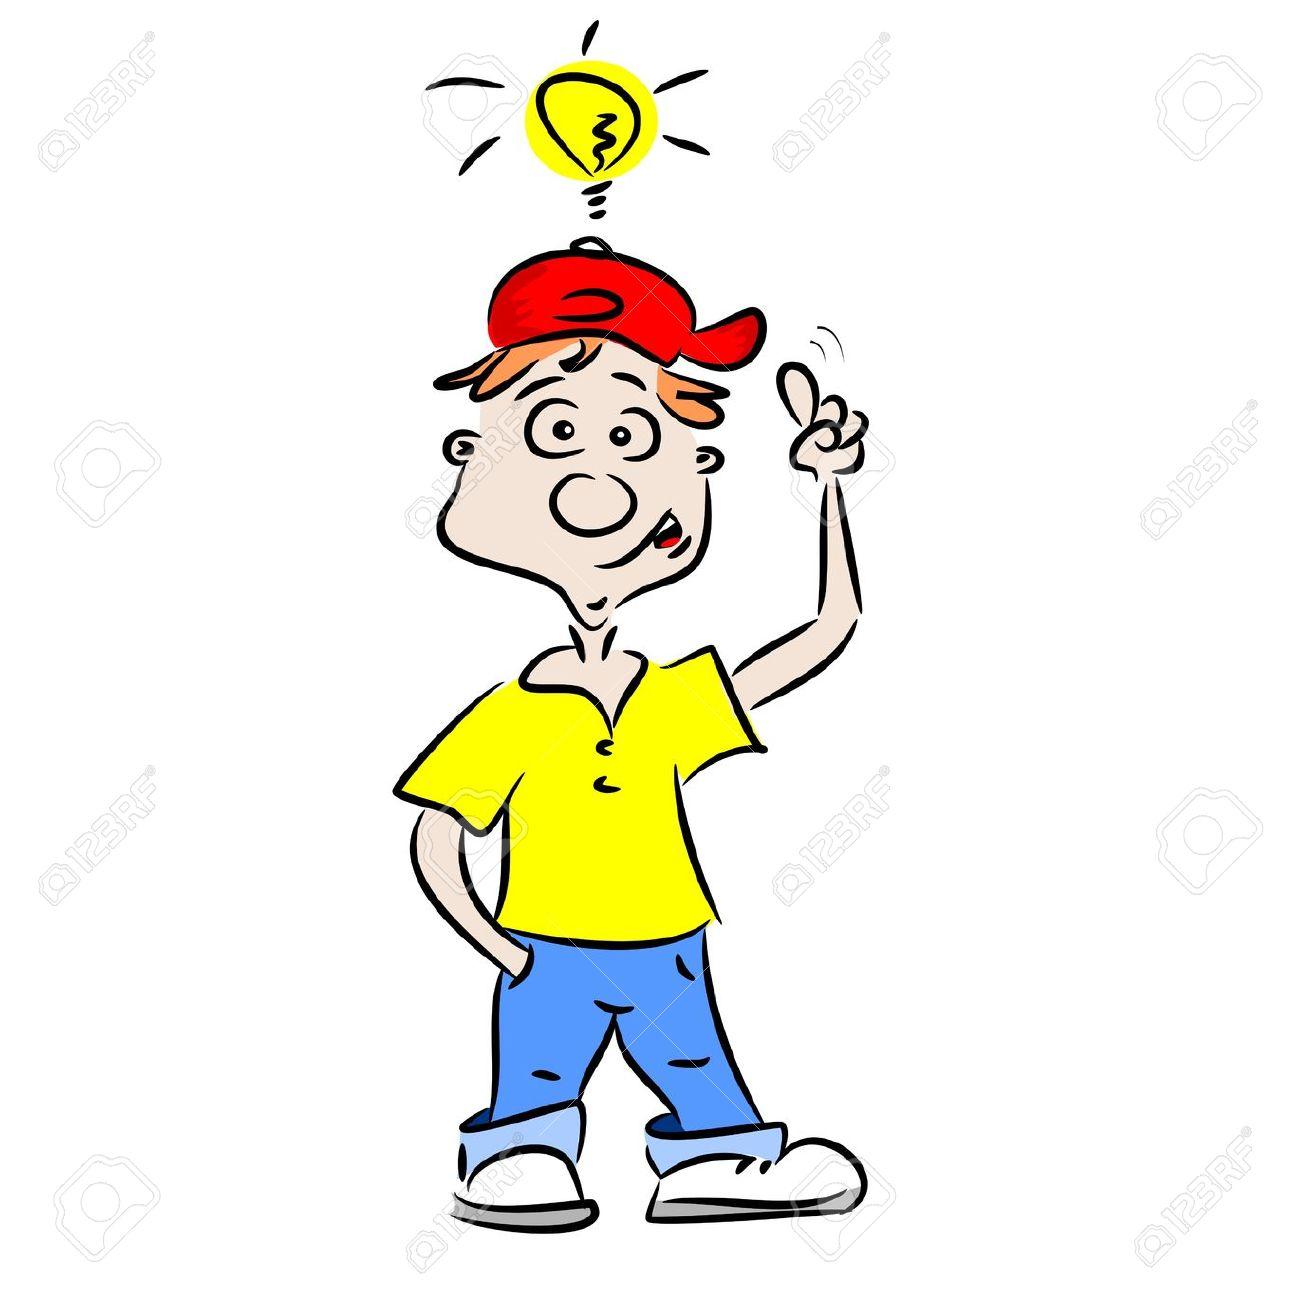 A Cartoon Boy With A Good Idea Royalty Free Cliparts, Vectors, And.